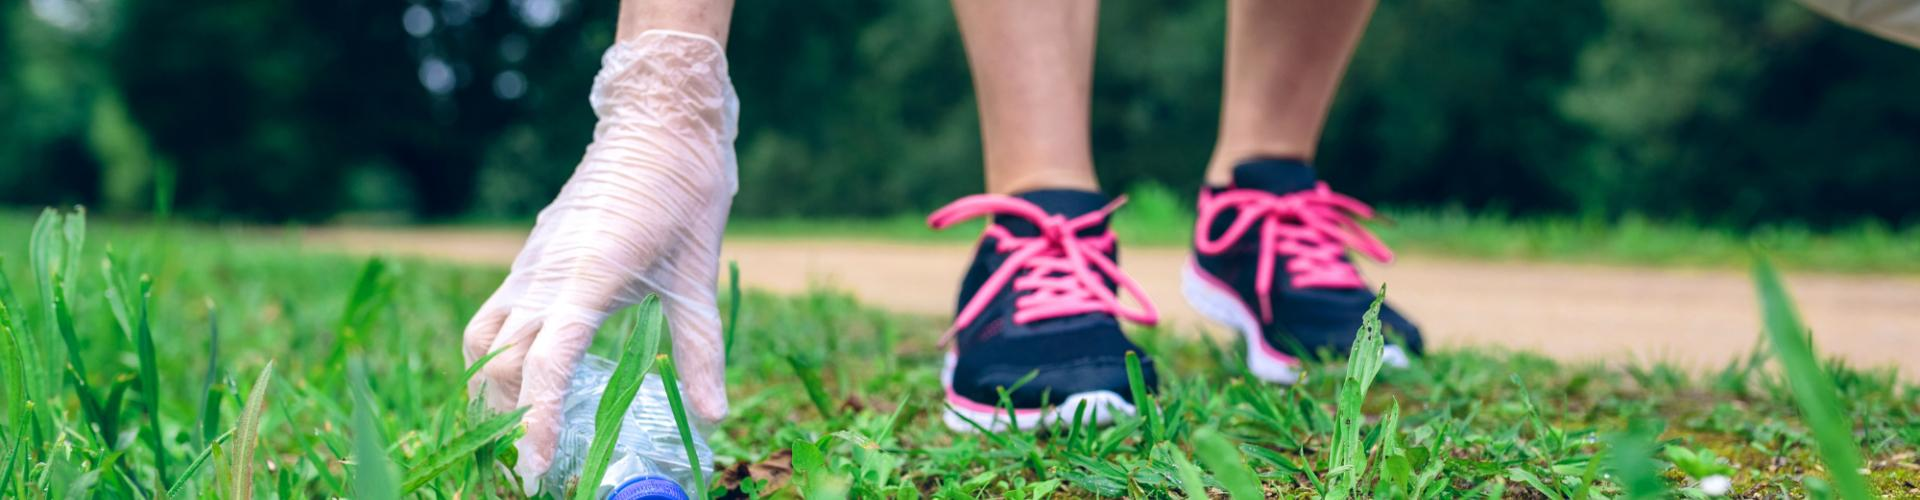 Fitness-Trend Plogging